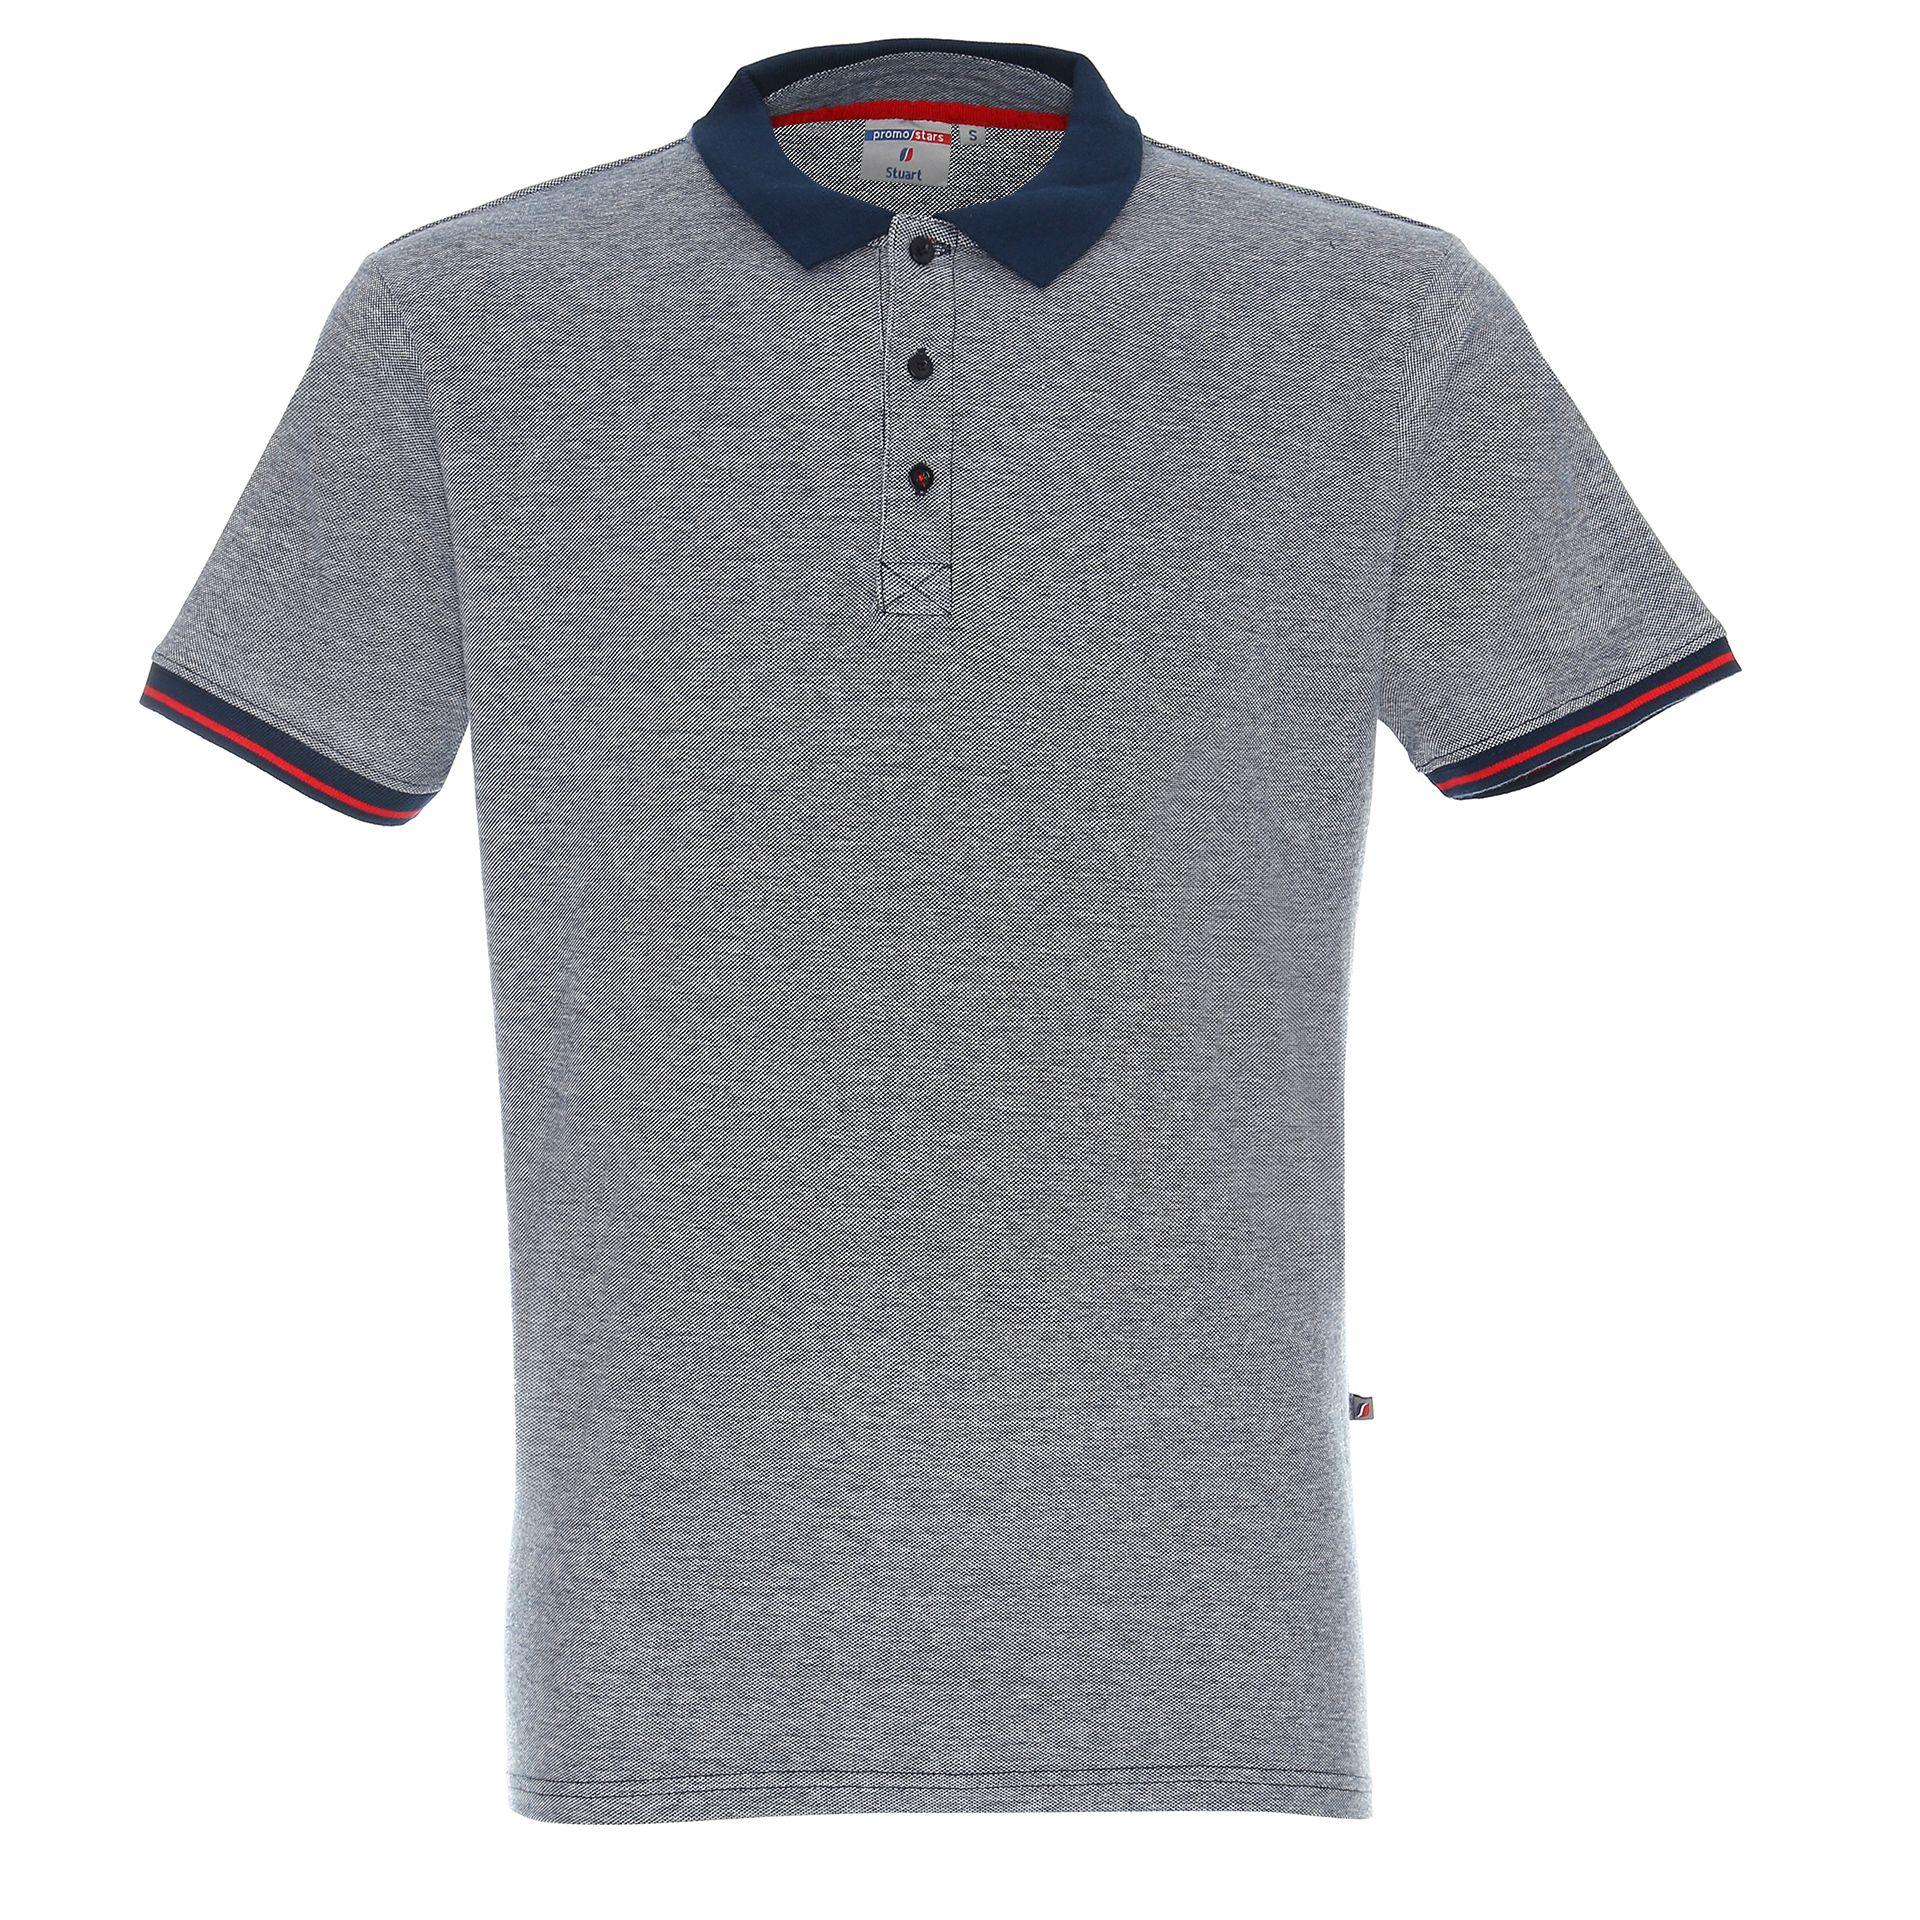 Koszulka reklamowa Polo stuart